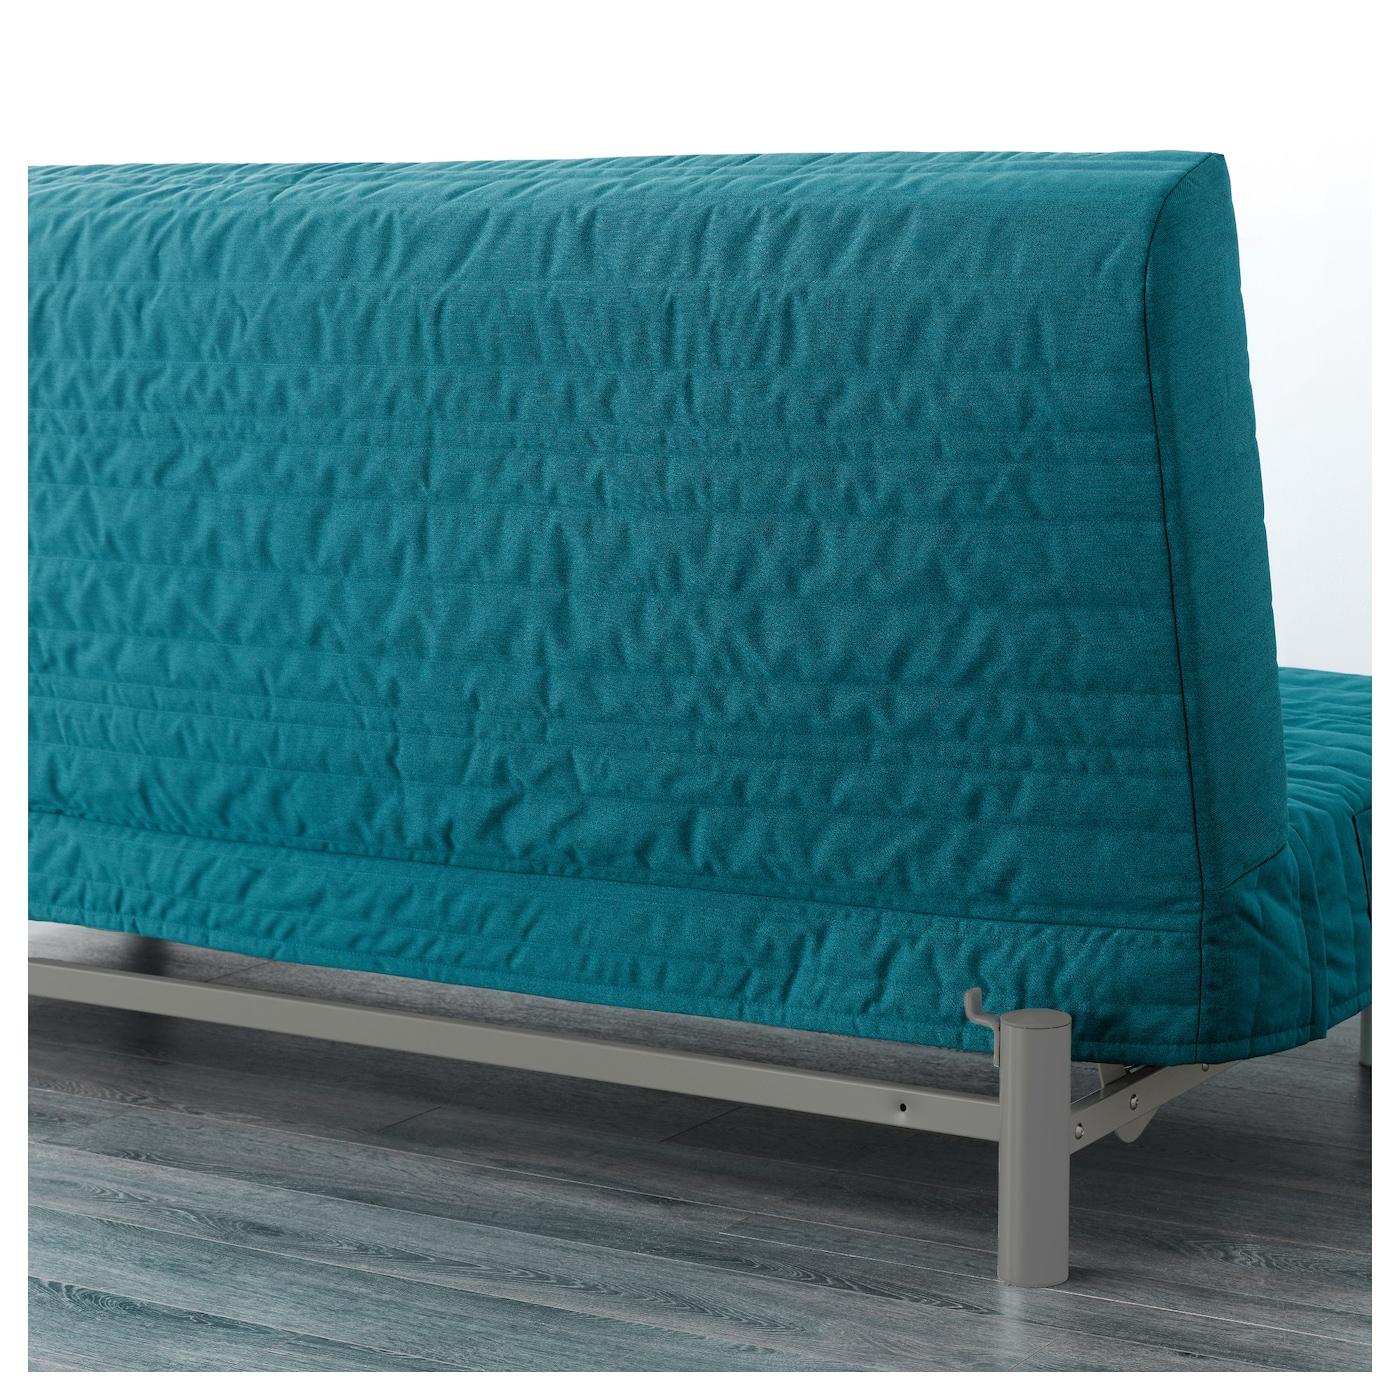 beddinge l v s three seat sofa bed knisa turquoise ikea. Black Bedroom Furniture Sets. Home Design Ideas